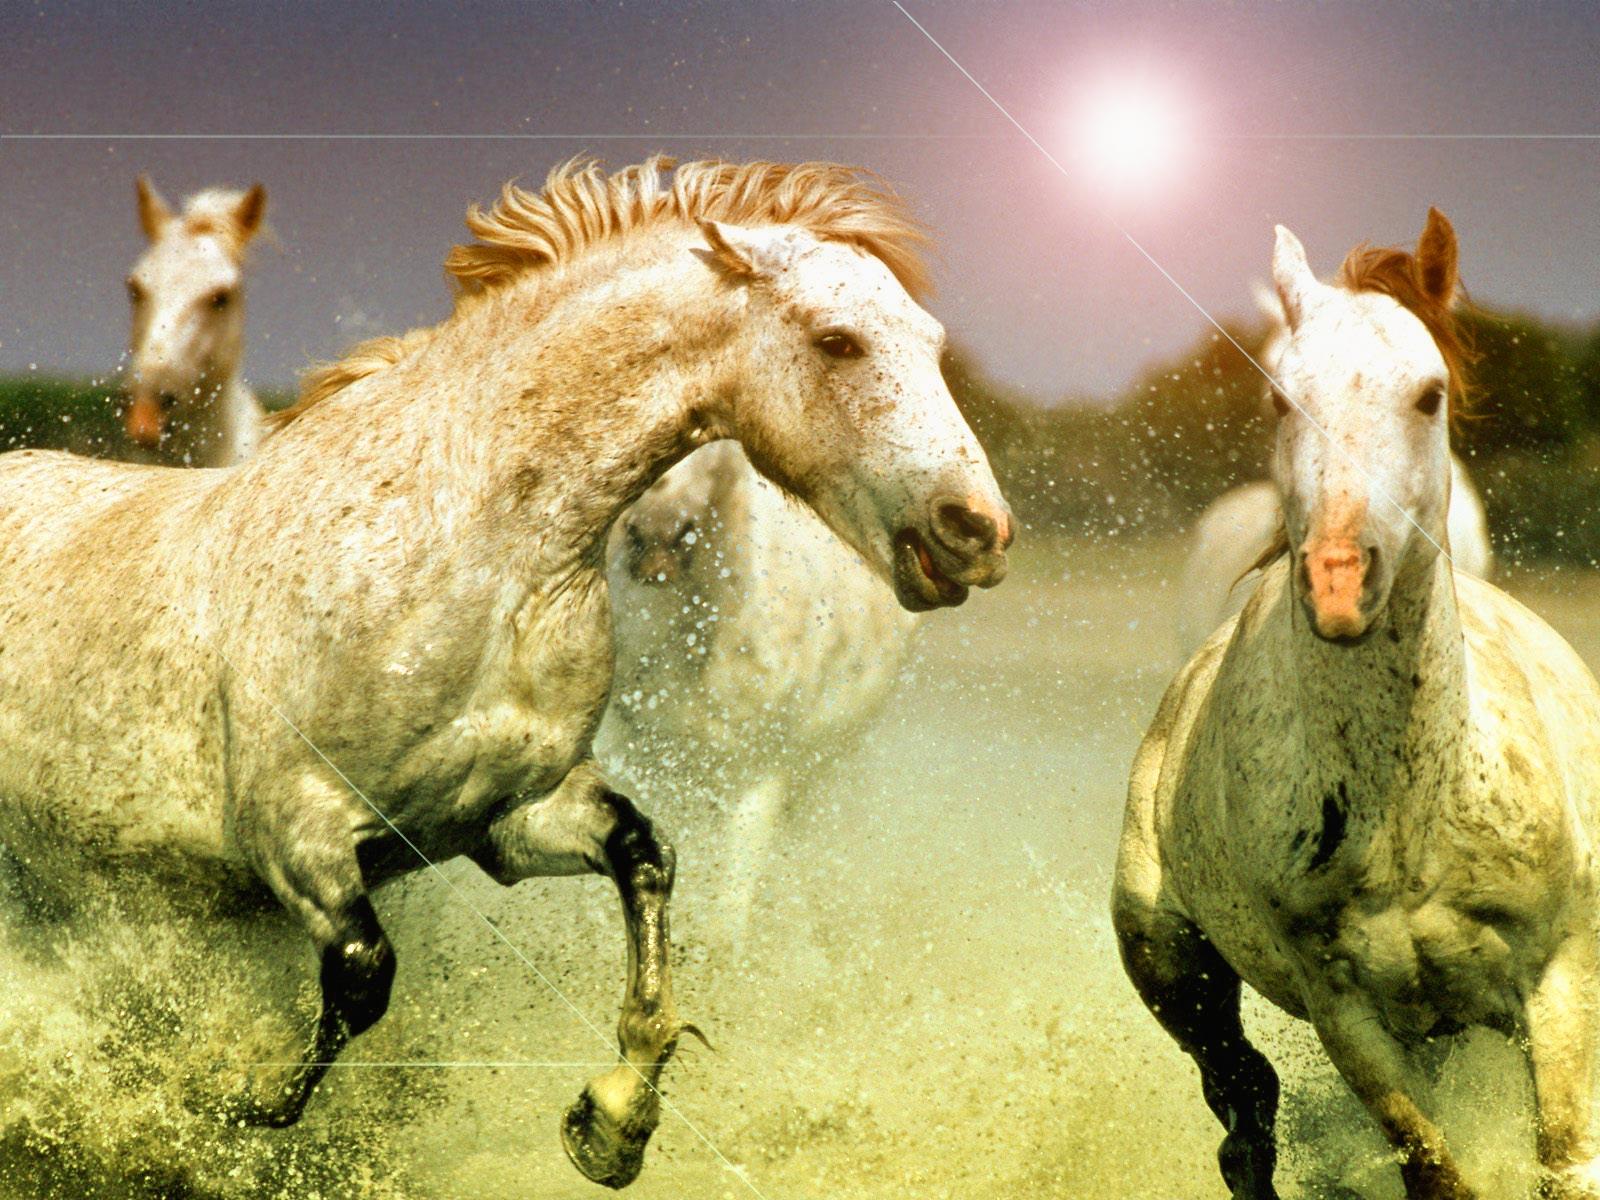 Free Download Windows 7 Thoroughbred Horse Hd Wallpaper High